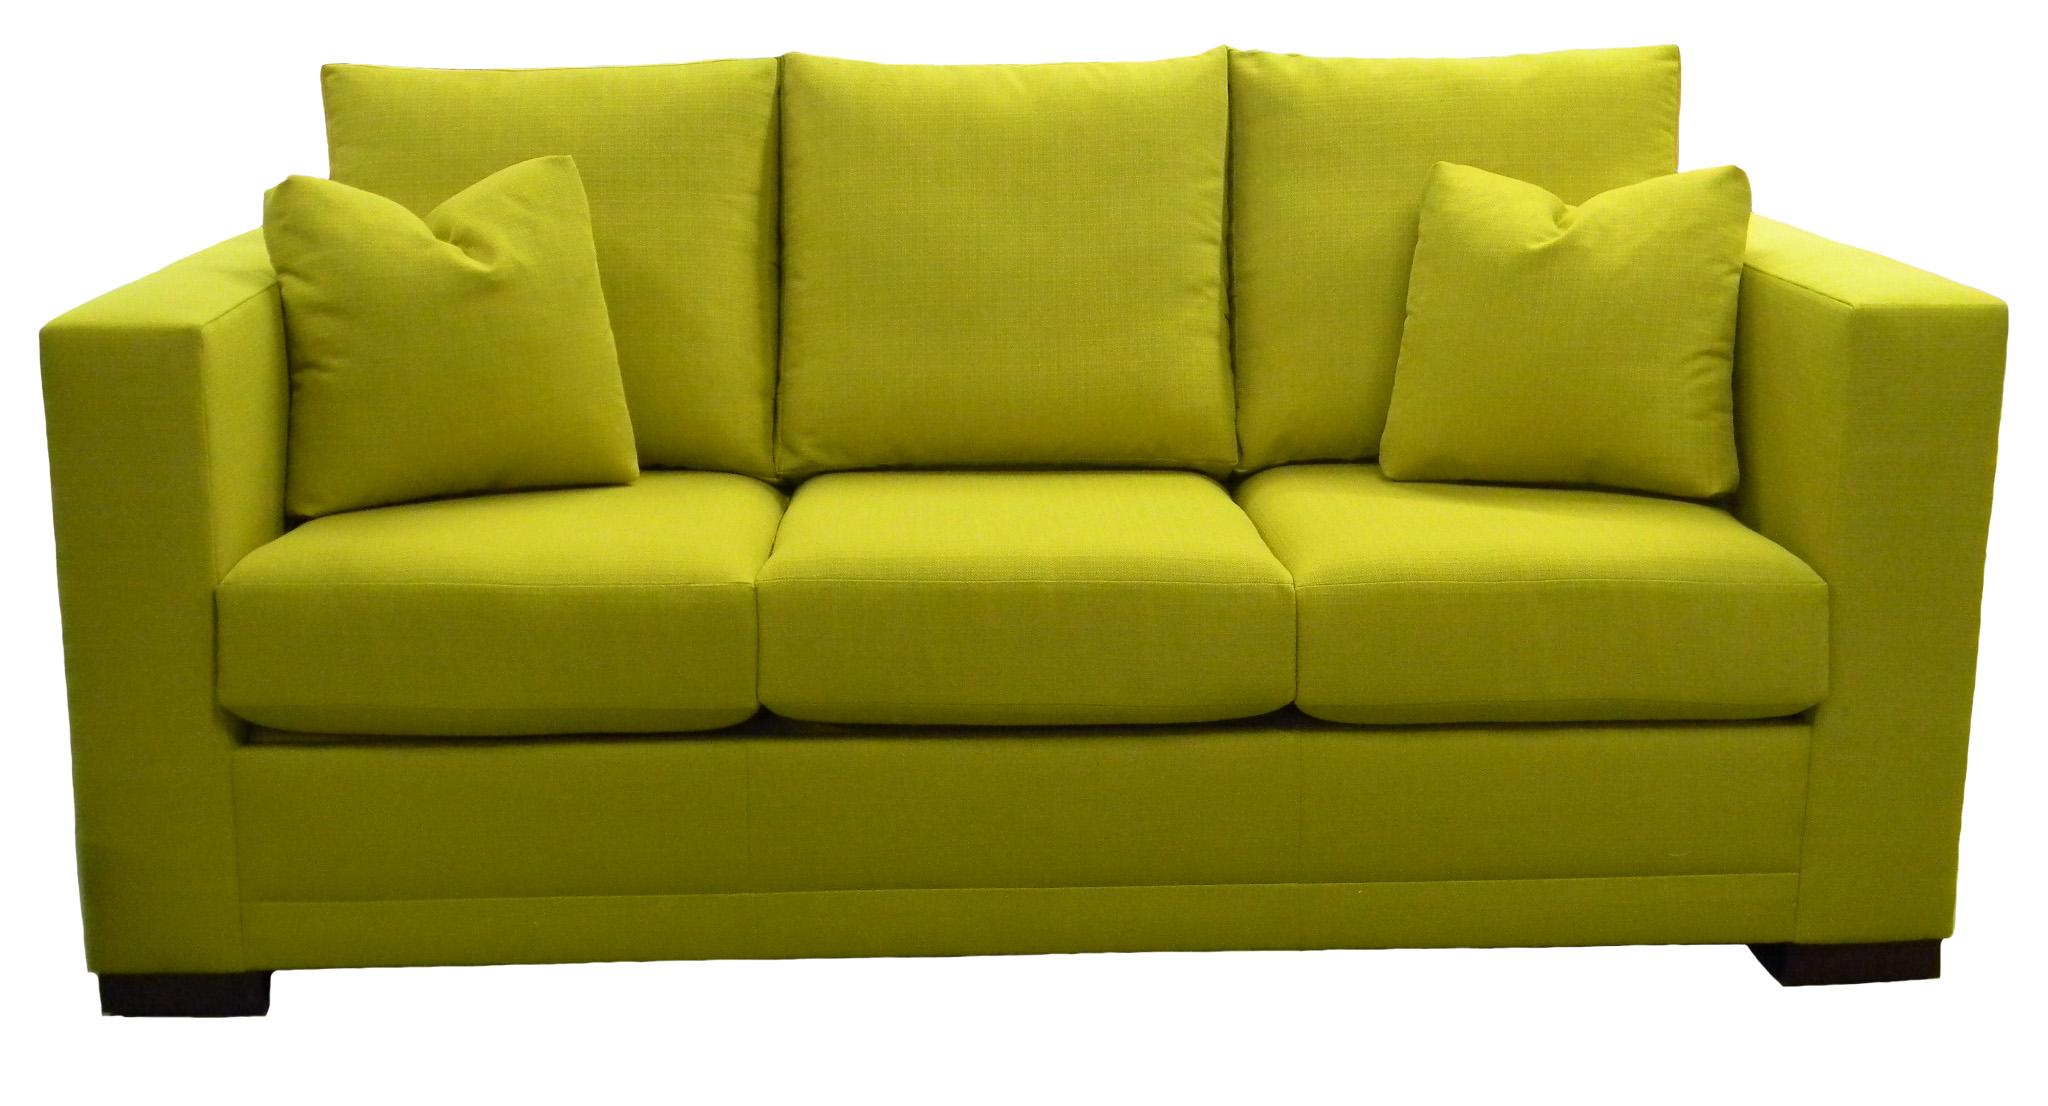 usa made sleeper sofa 7 piece set costco marlowe queen carolina chair american